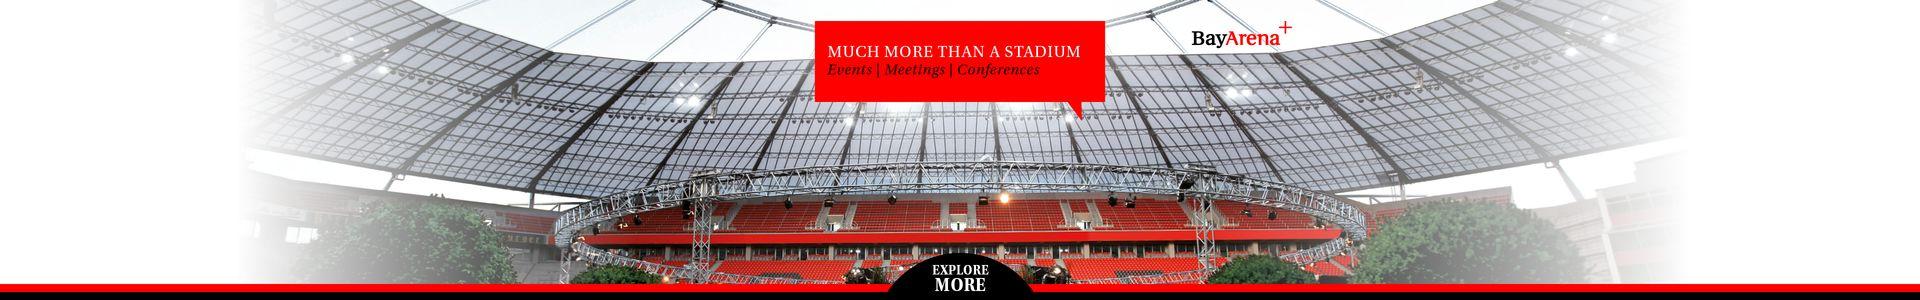 The BayArena - our stadium  da9a02a252a42